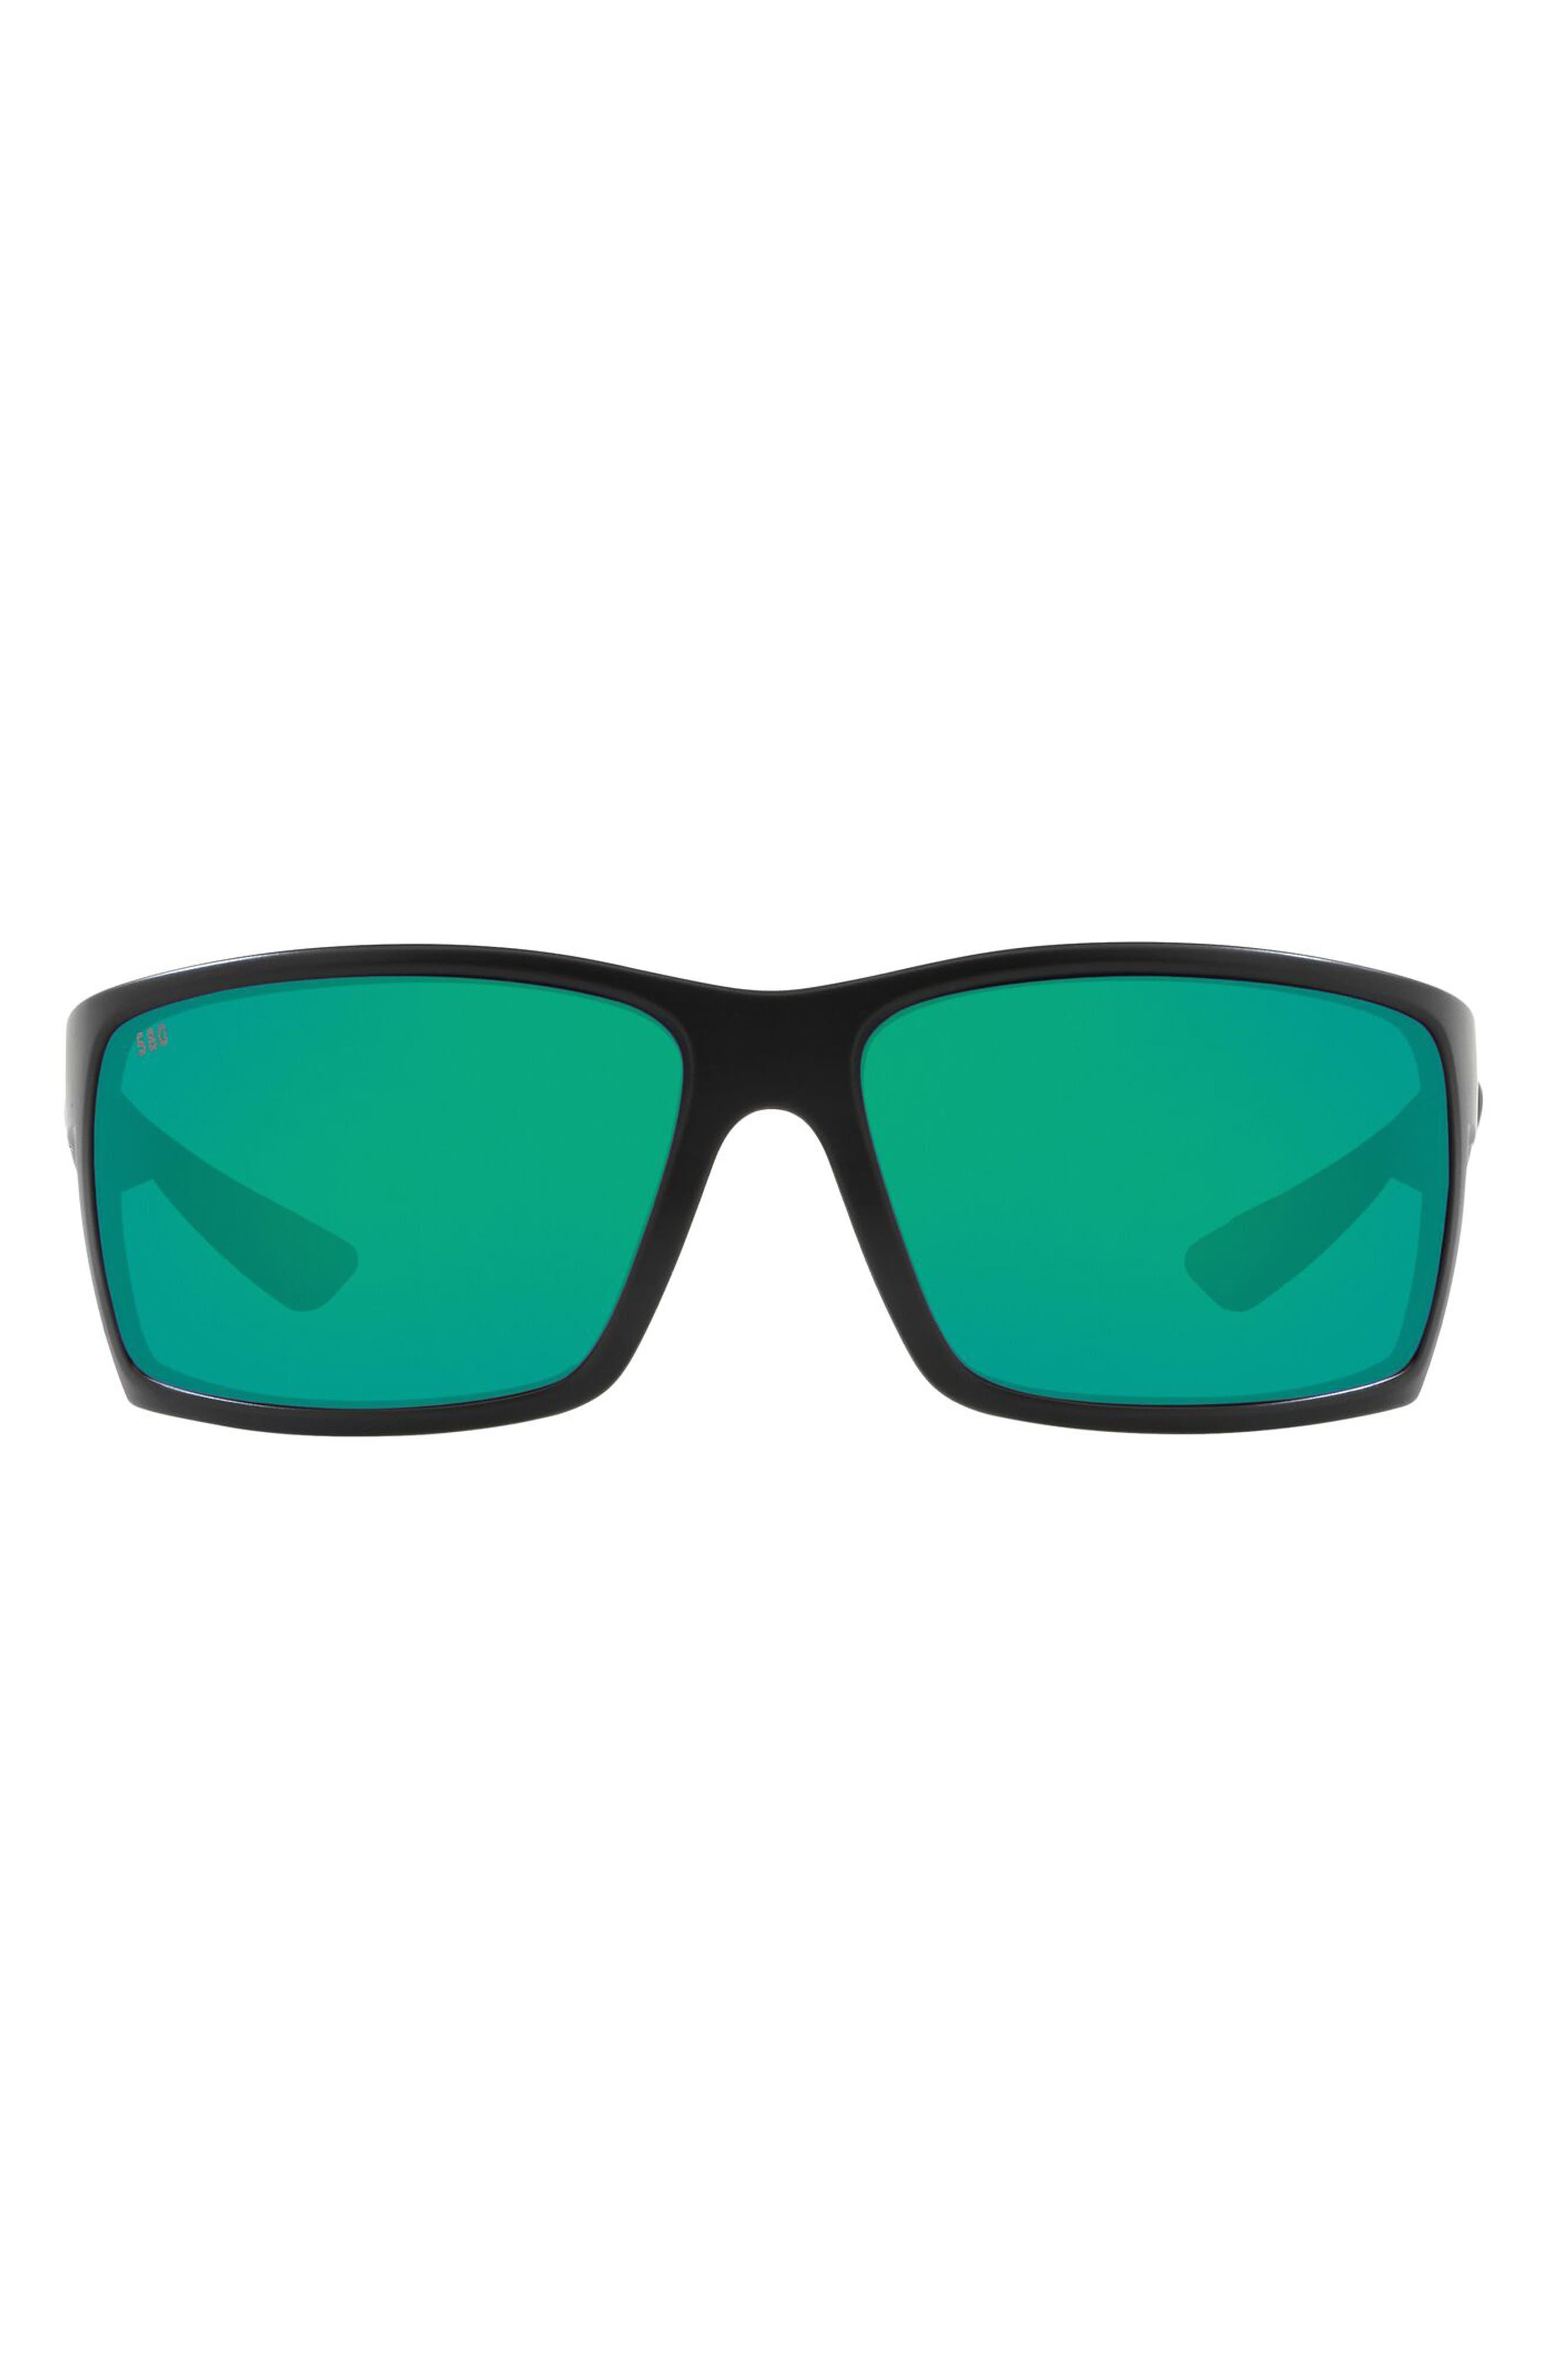 Reefton 64mm Mirrored Polarized Oversize Sunglasses